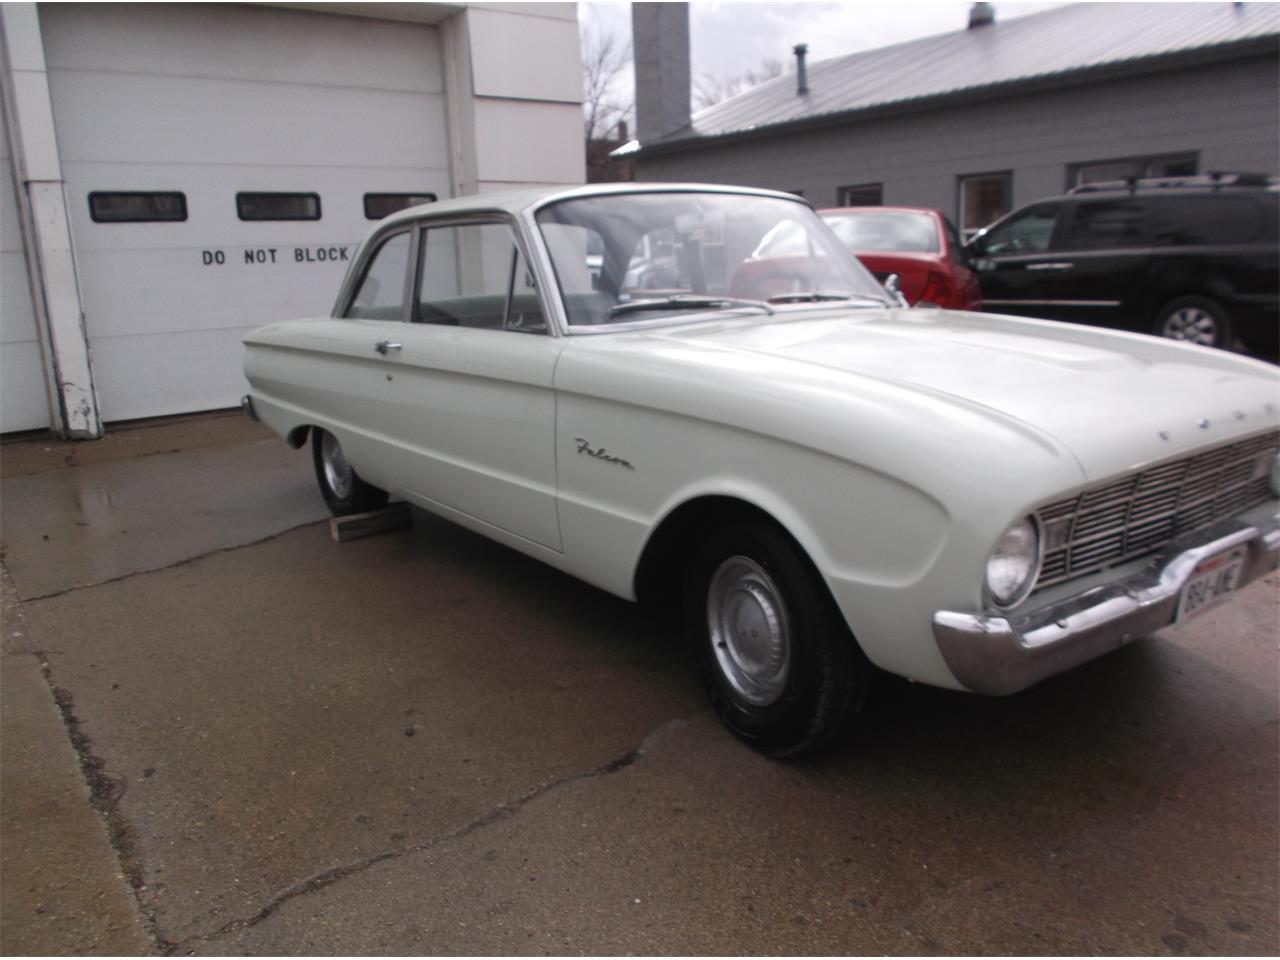 For Sale: 1960 Ford Falcon in Genoa City, Wisconsin